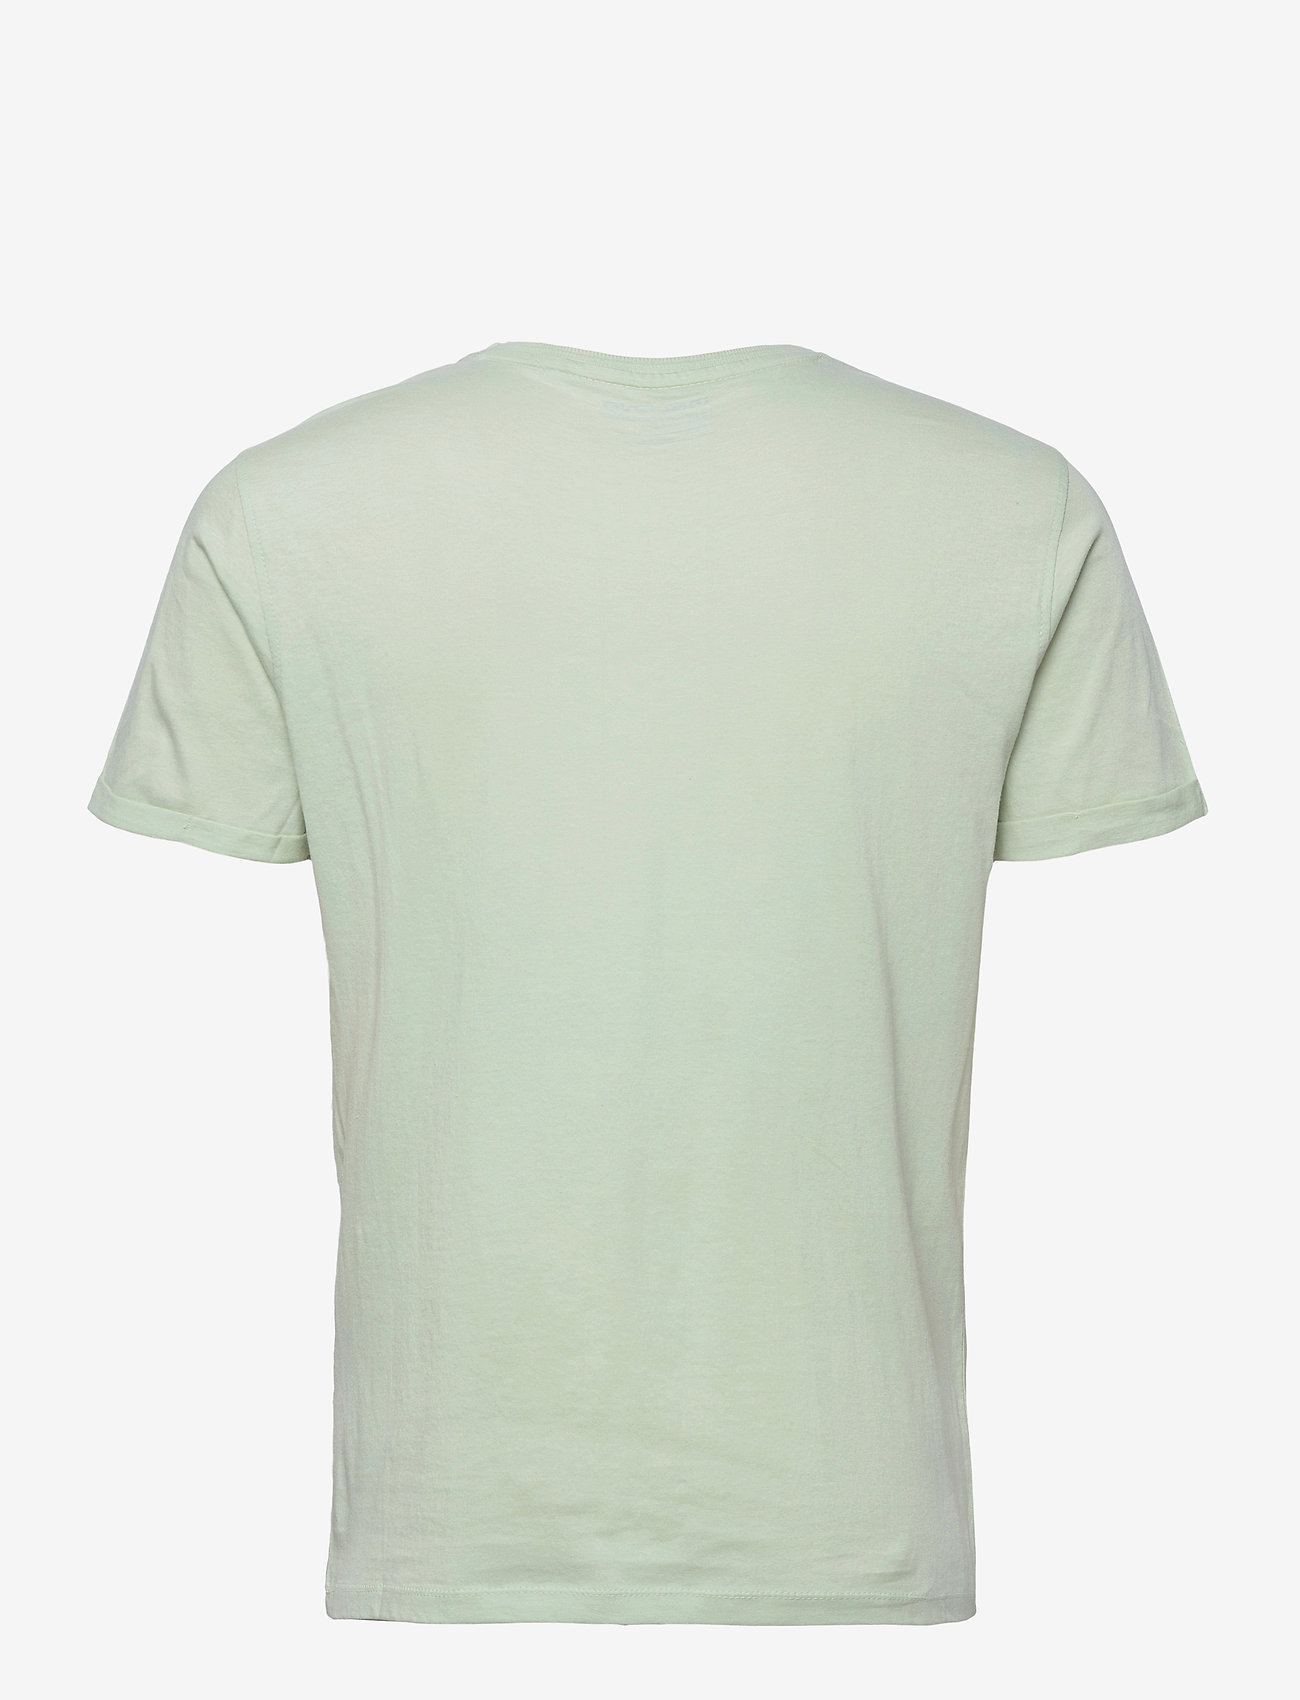 Blend - Tee - Organic - basic t-shirts - sea foam - 1